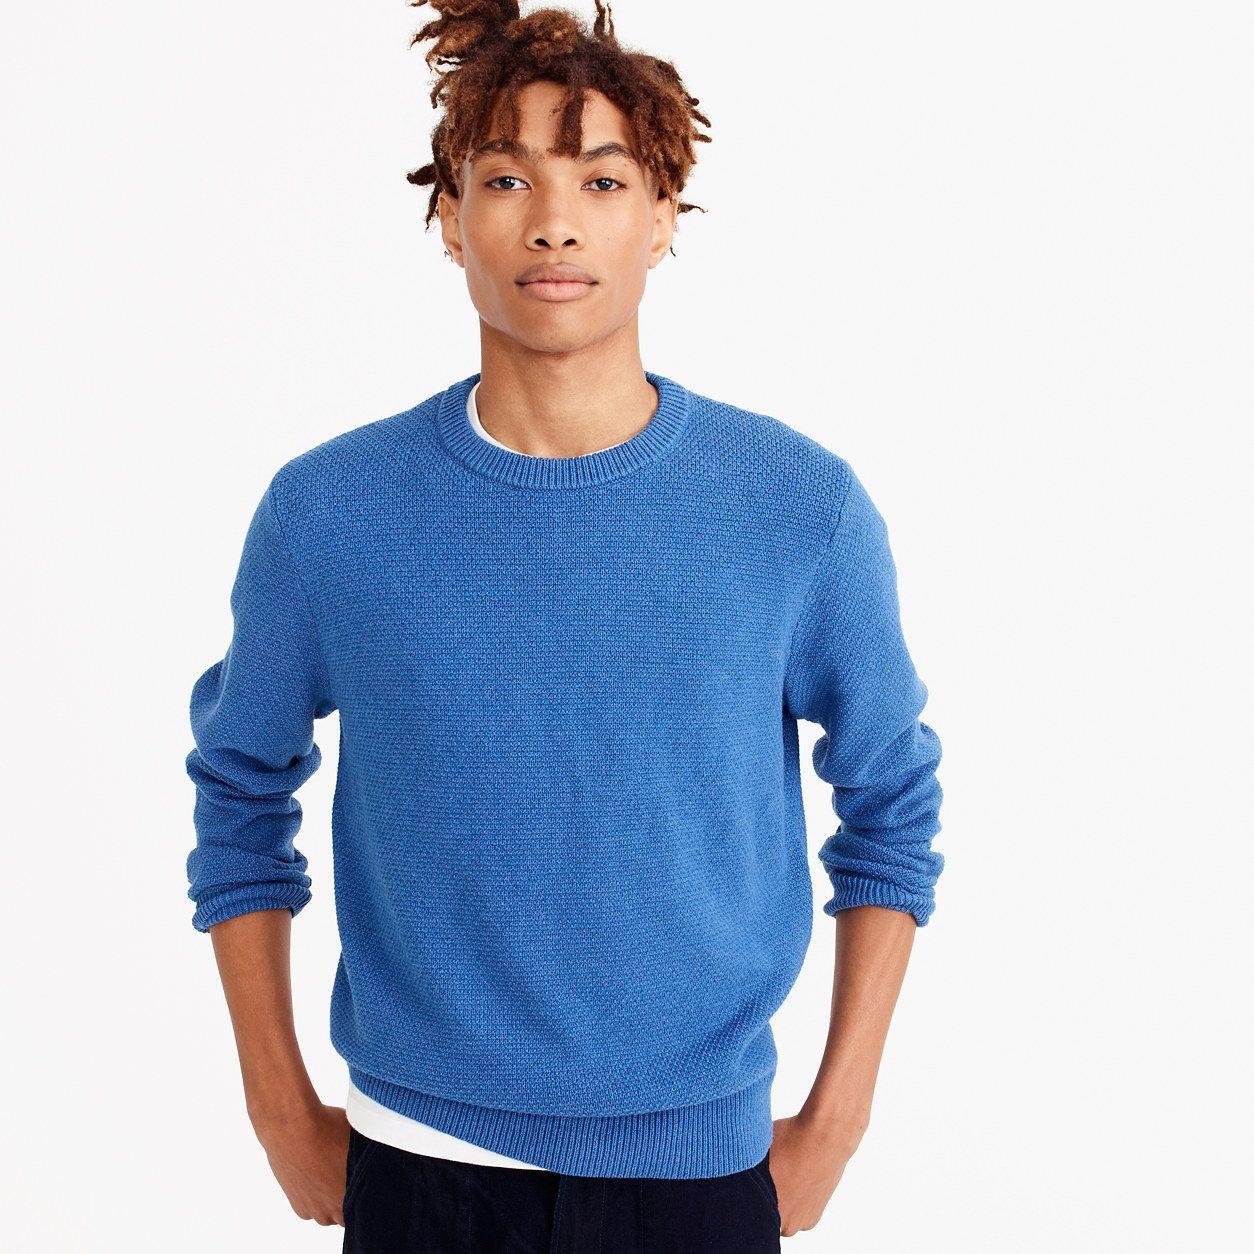 J.Crew Mens Cotton Crewneck Sweater In Moss Stitch (Size XXL